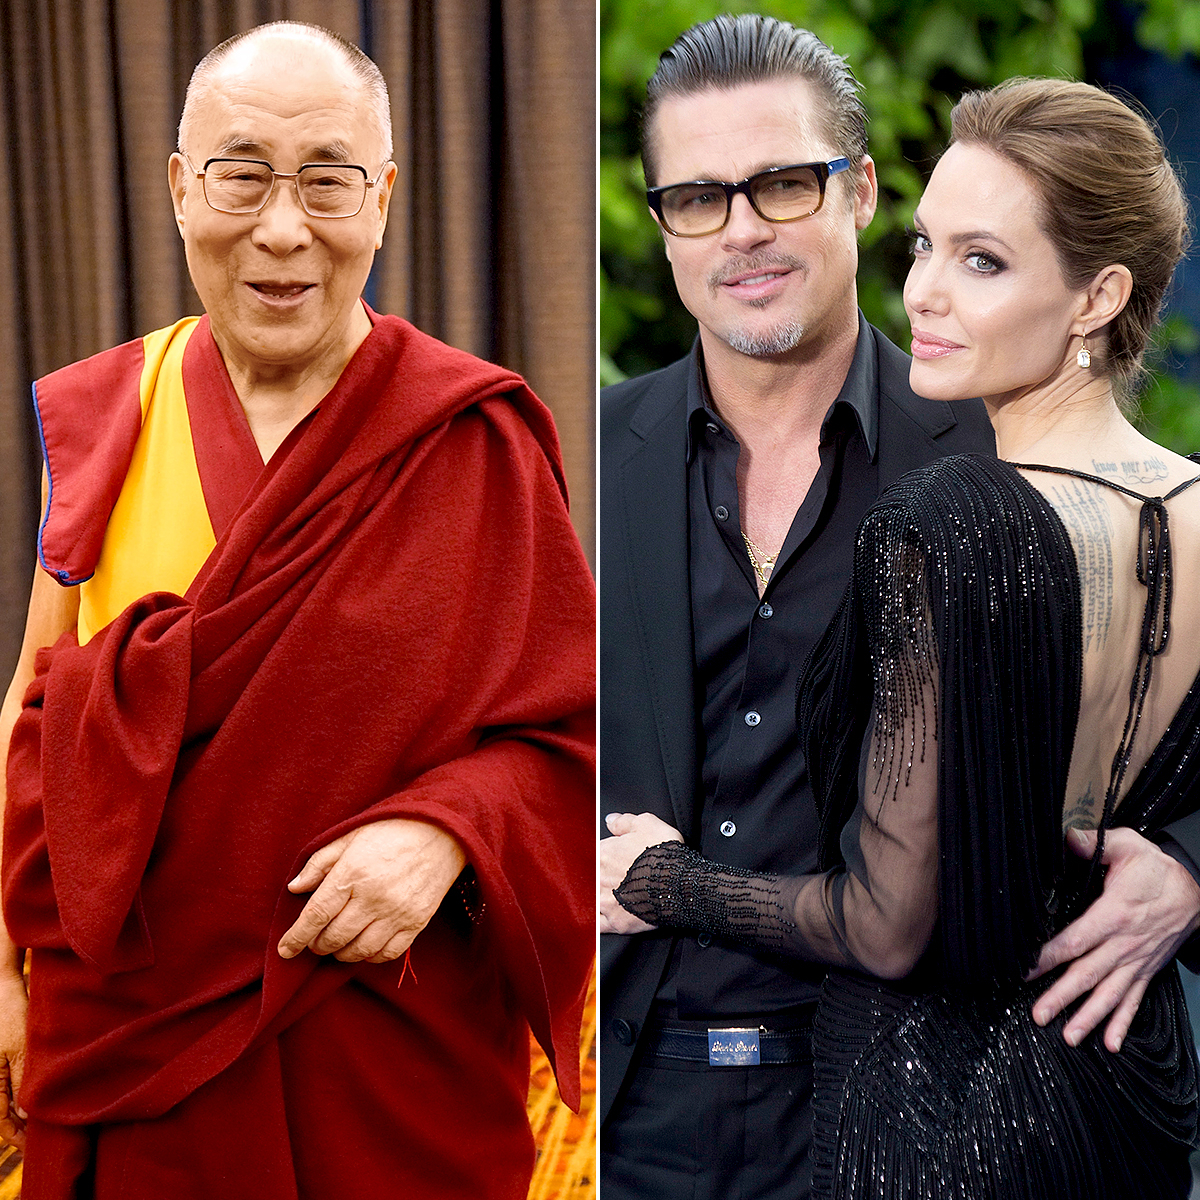 The Dalai Lama comments on Angelina Jolie and Brad Pitt's split.